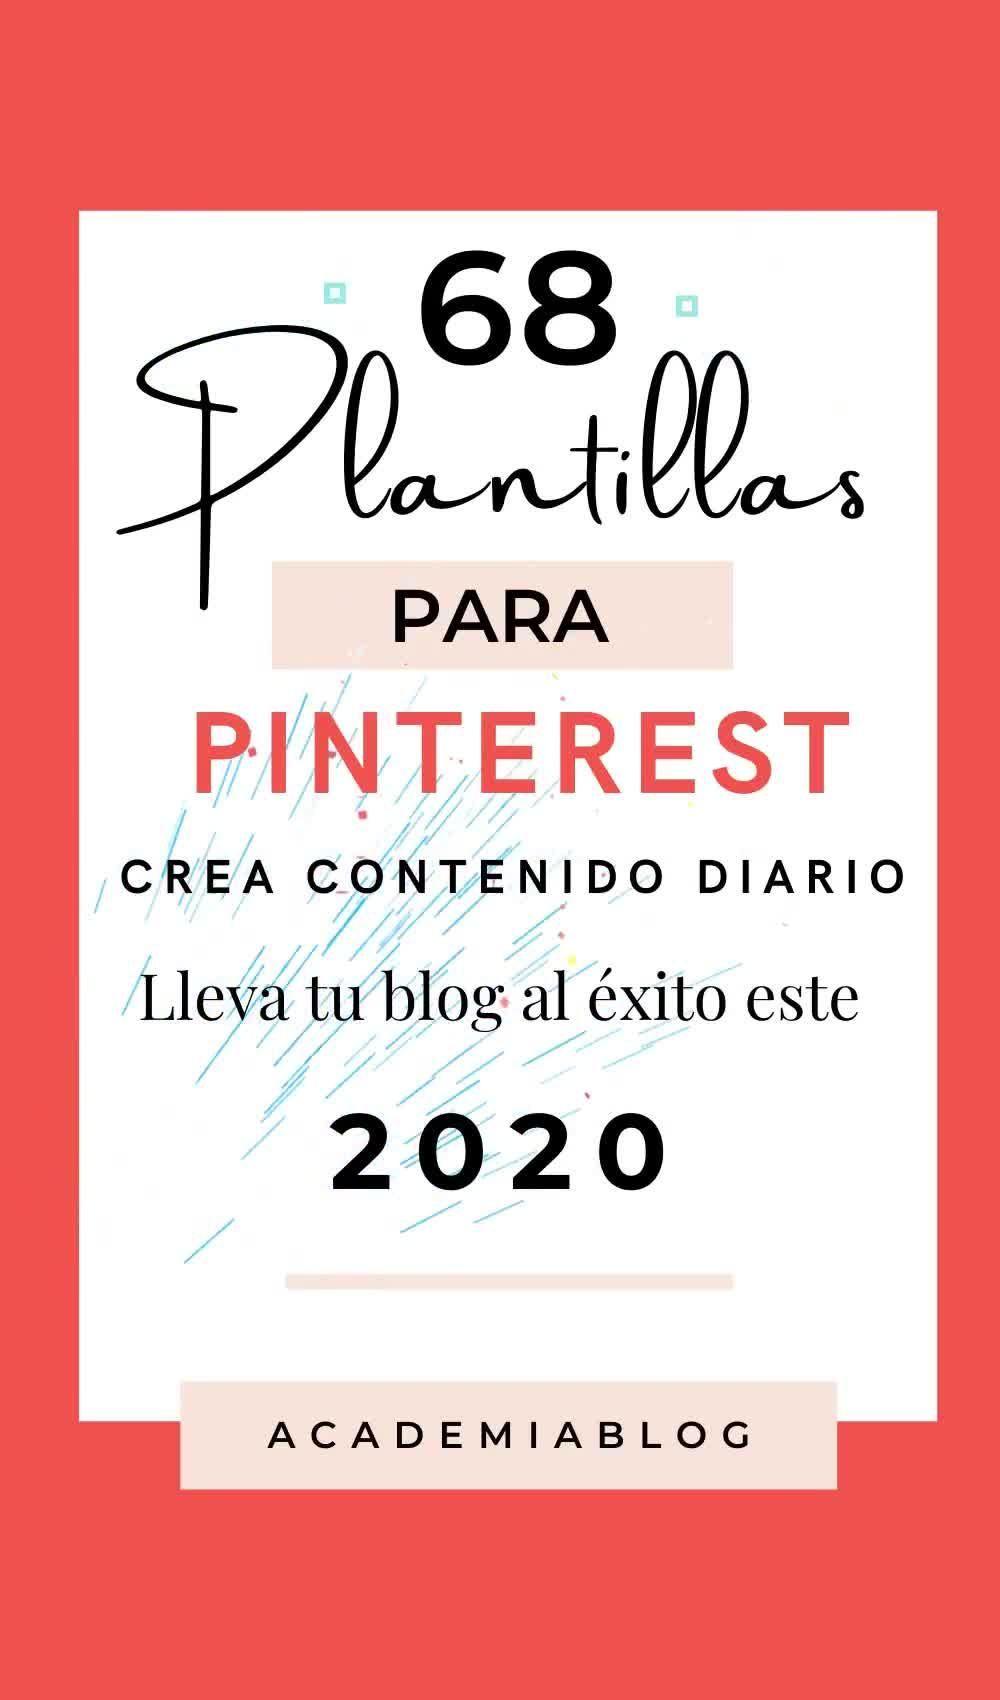 68 Plantillas Pinterest Kit Pro - Academia Blog